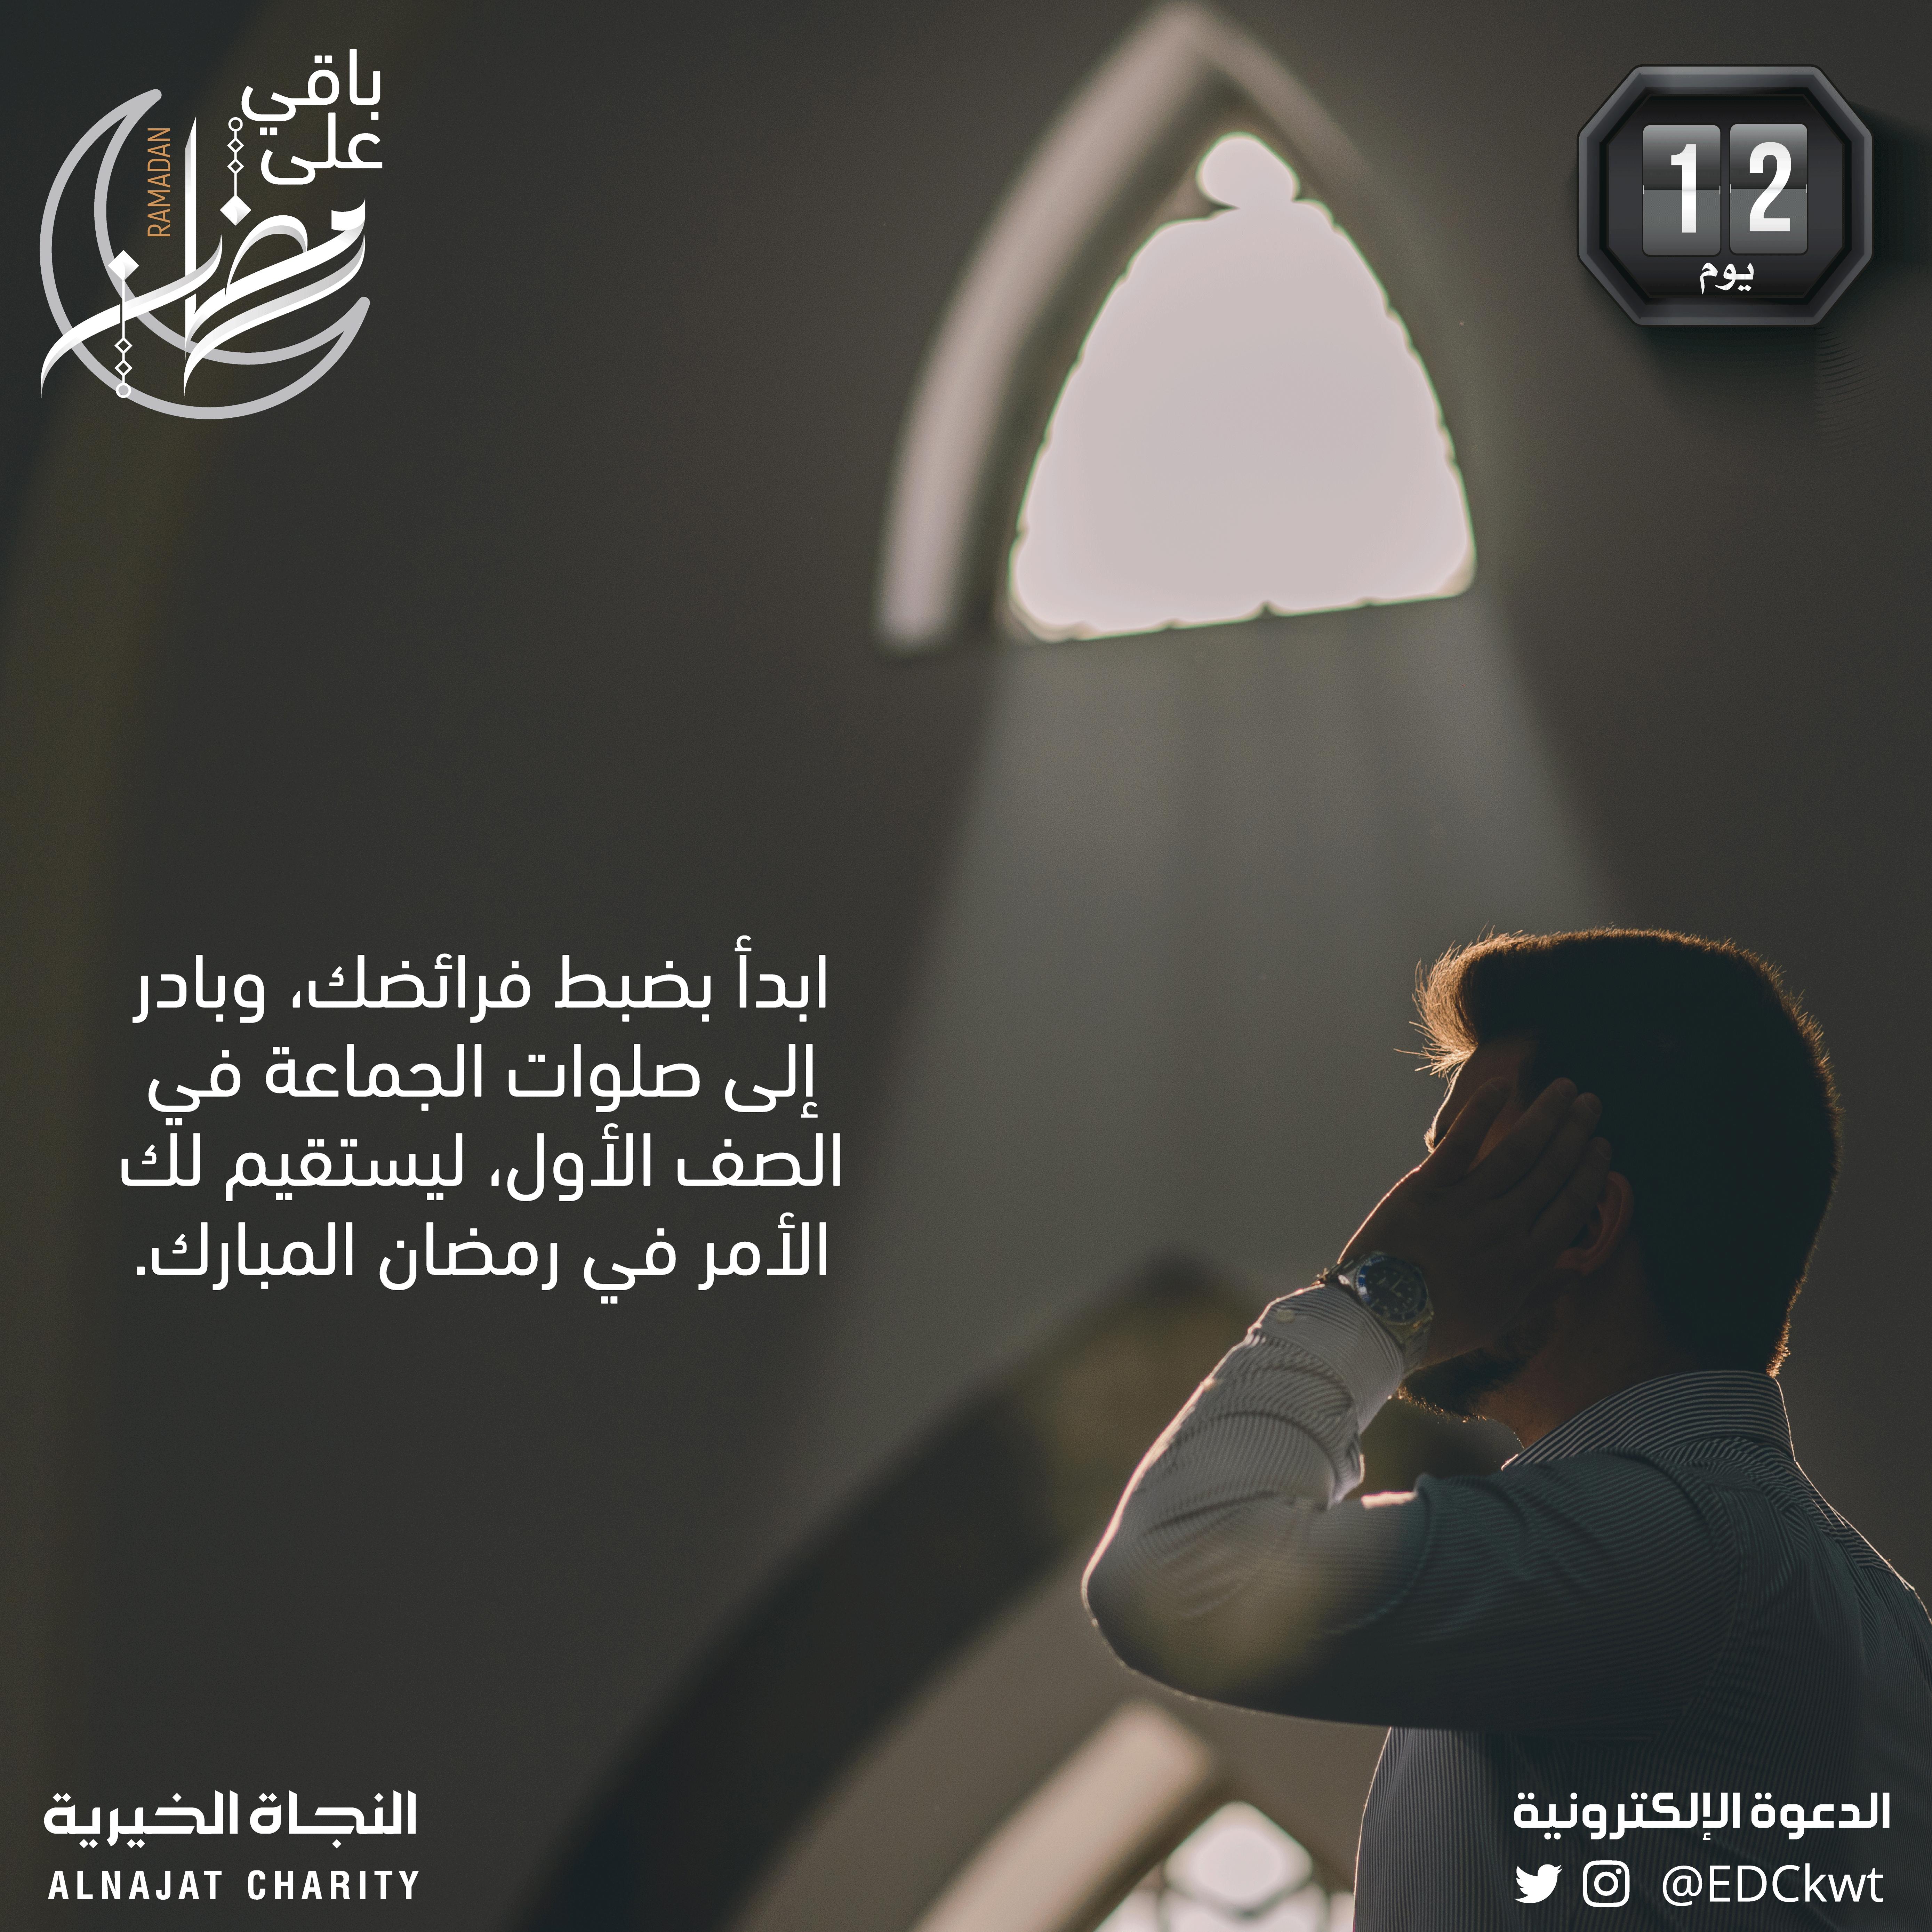 اضبط فرائضك قبل رمضان